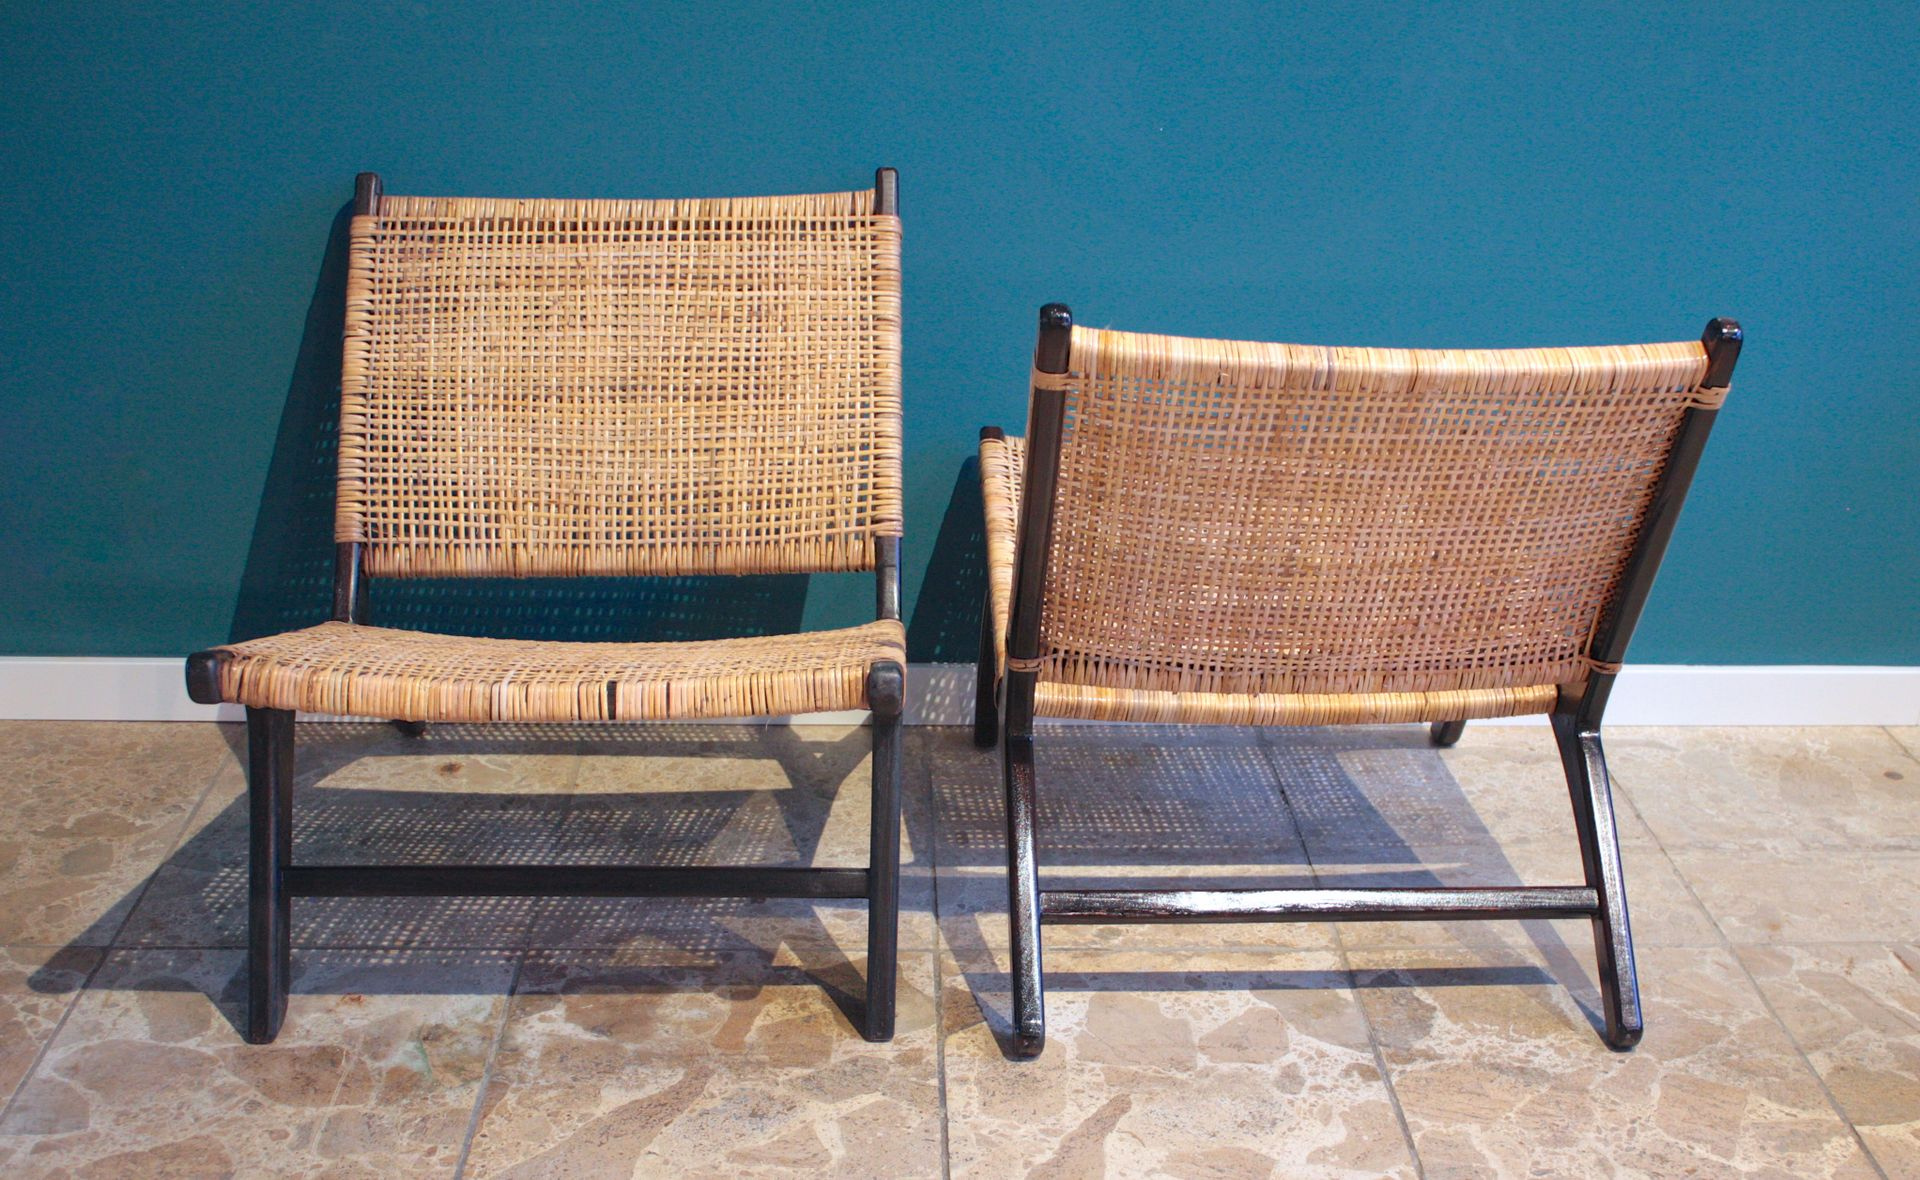 skandinavische rattan st hle 2er set bei pamono kaufen. Black Bedroom Furniture Sets. Home Design Ideas